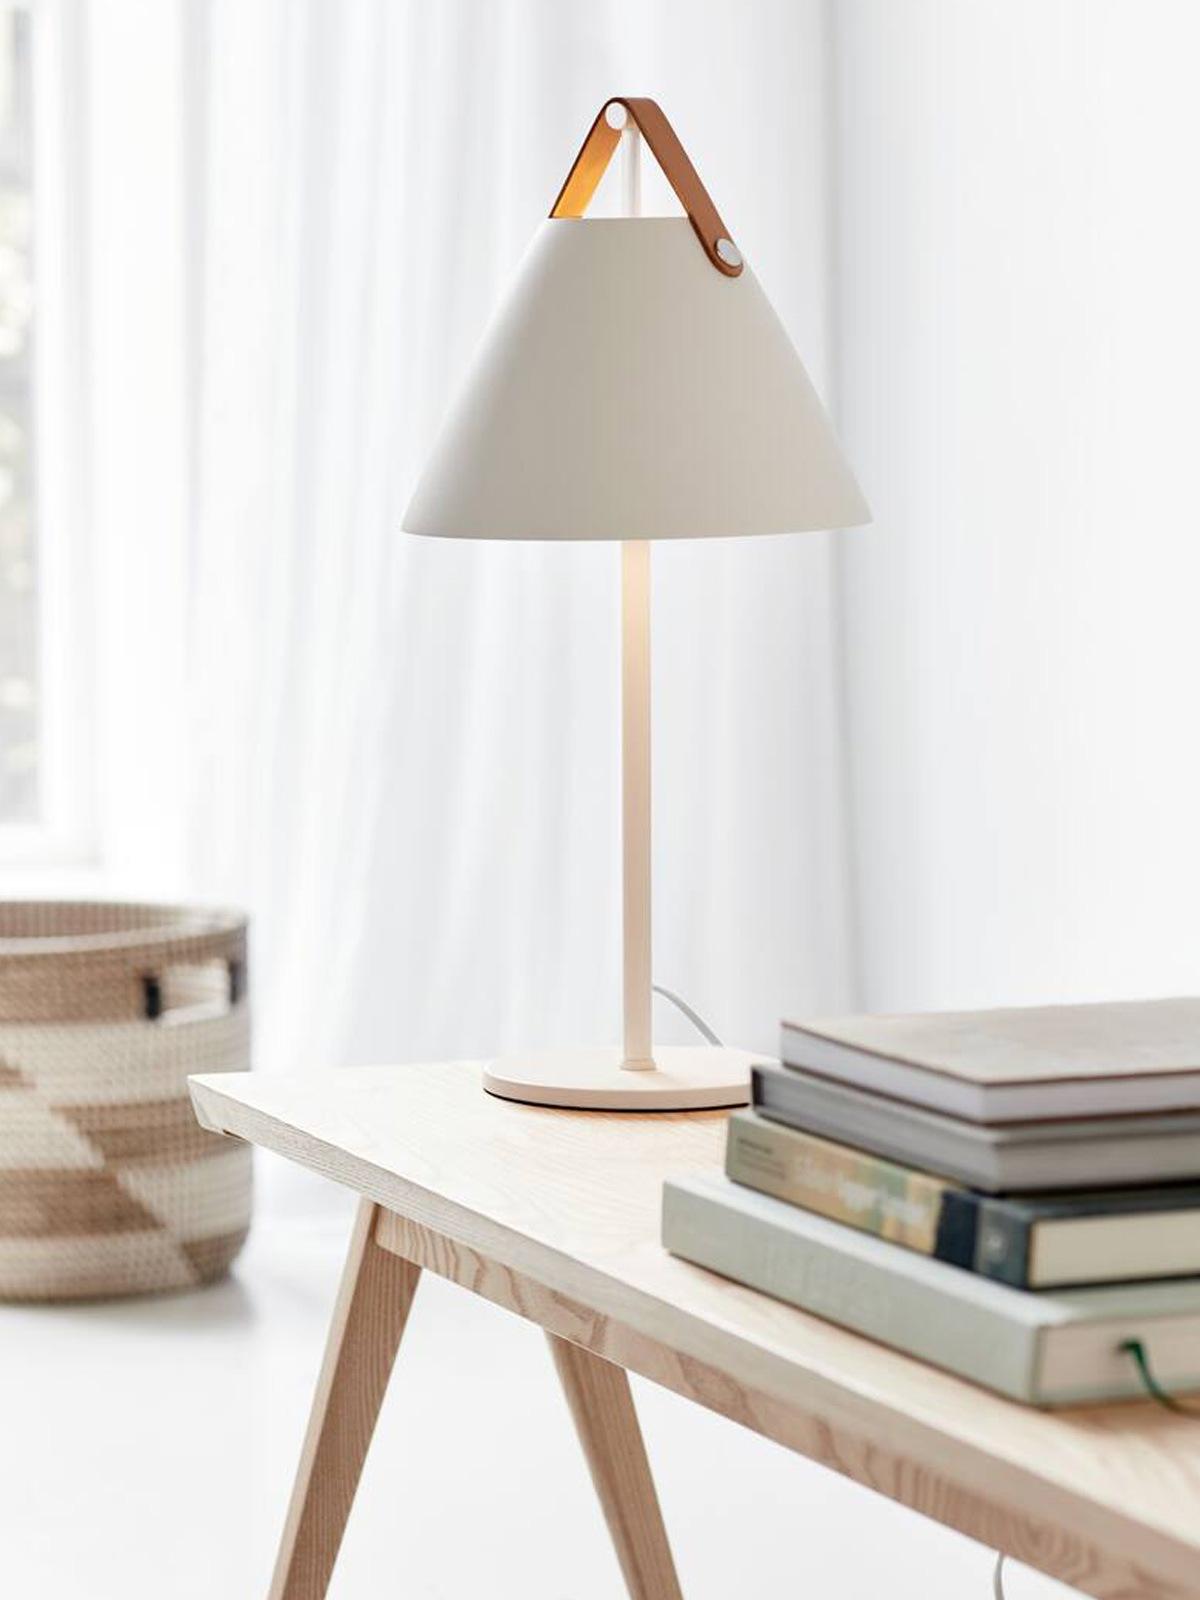 DesignOrt Blog: Strap Lampenfamilie Tischleuchte Design for the People Nordlux